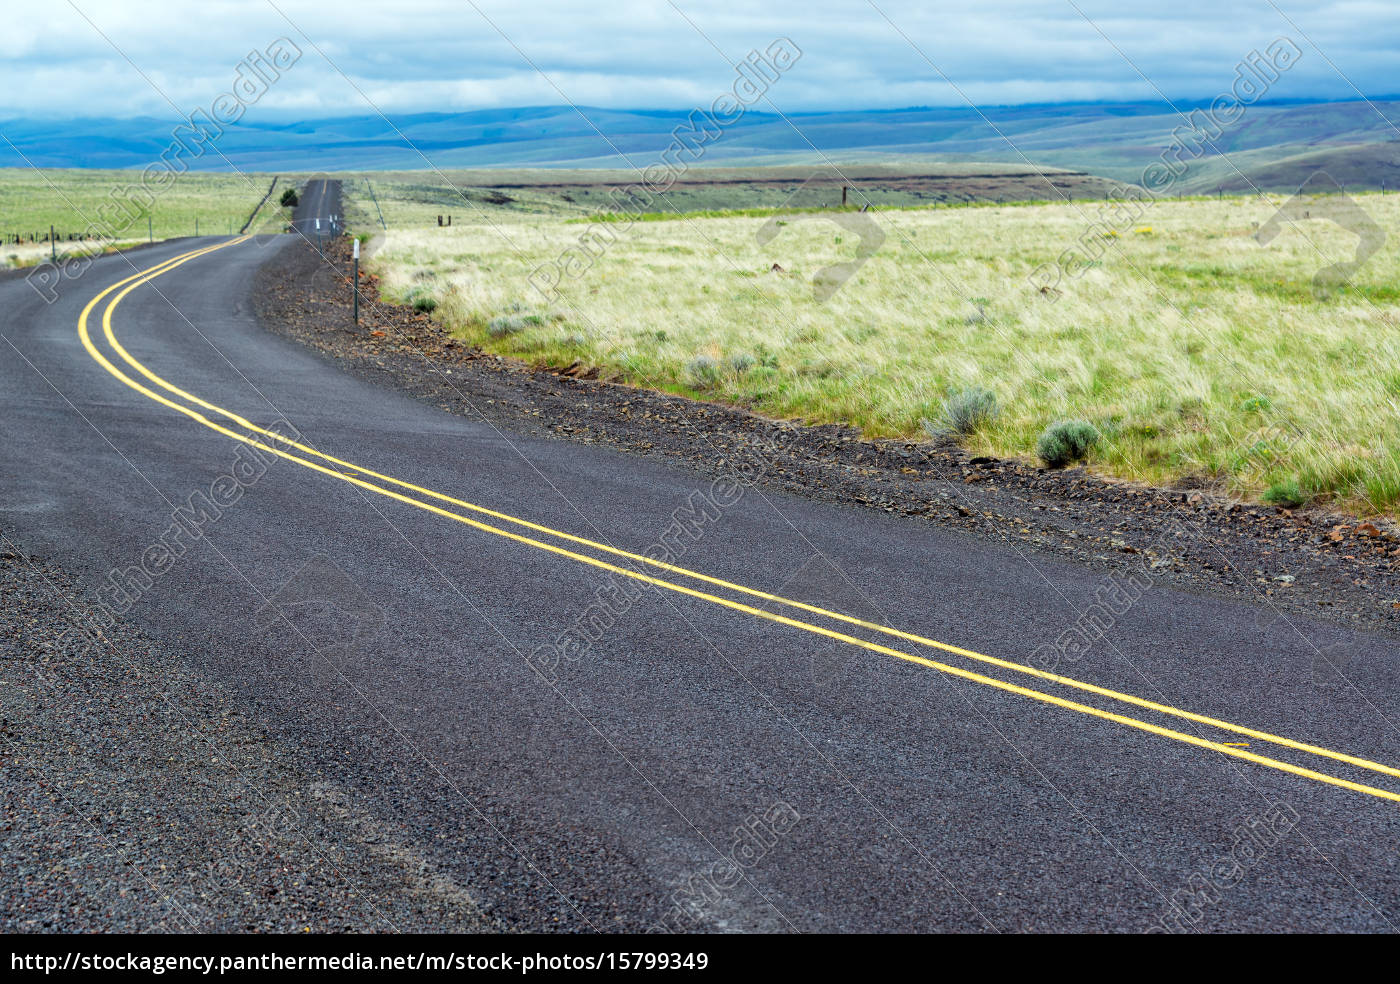 highway, in, central, oregon - 15799349